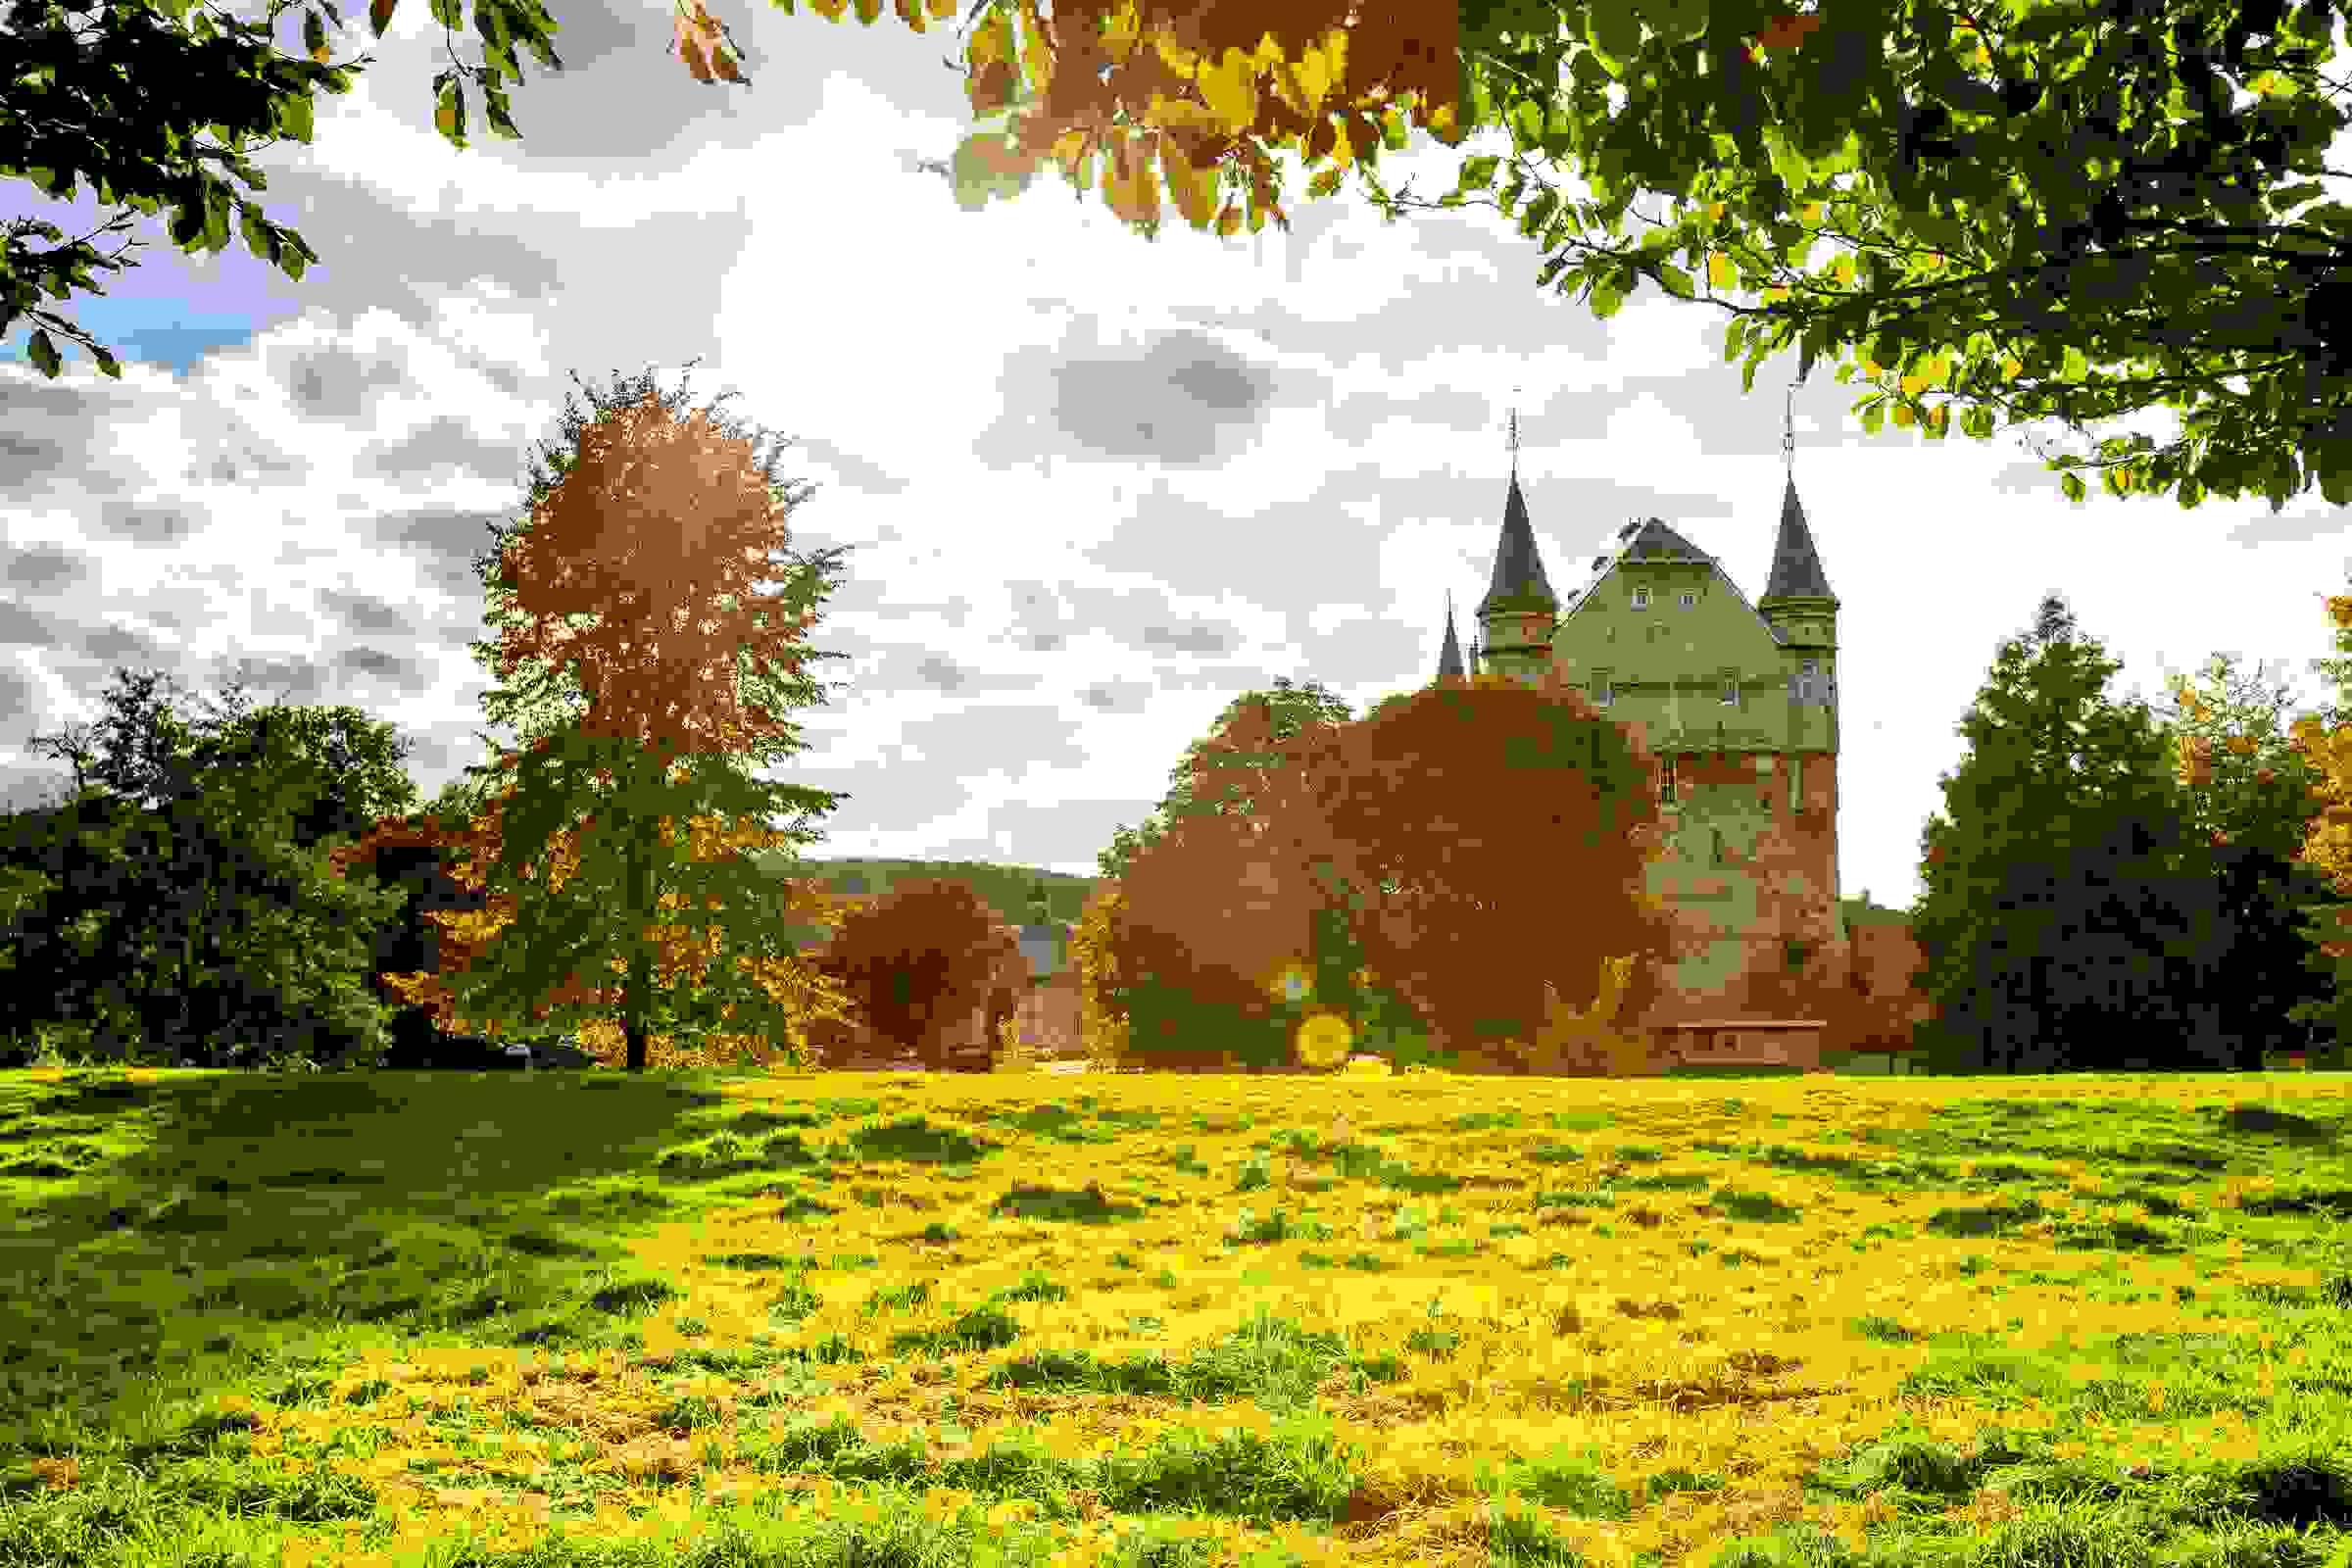 Nationaal Landschap Zuid Limburg